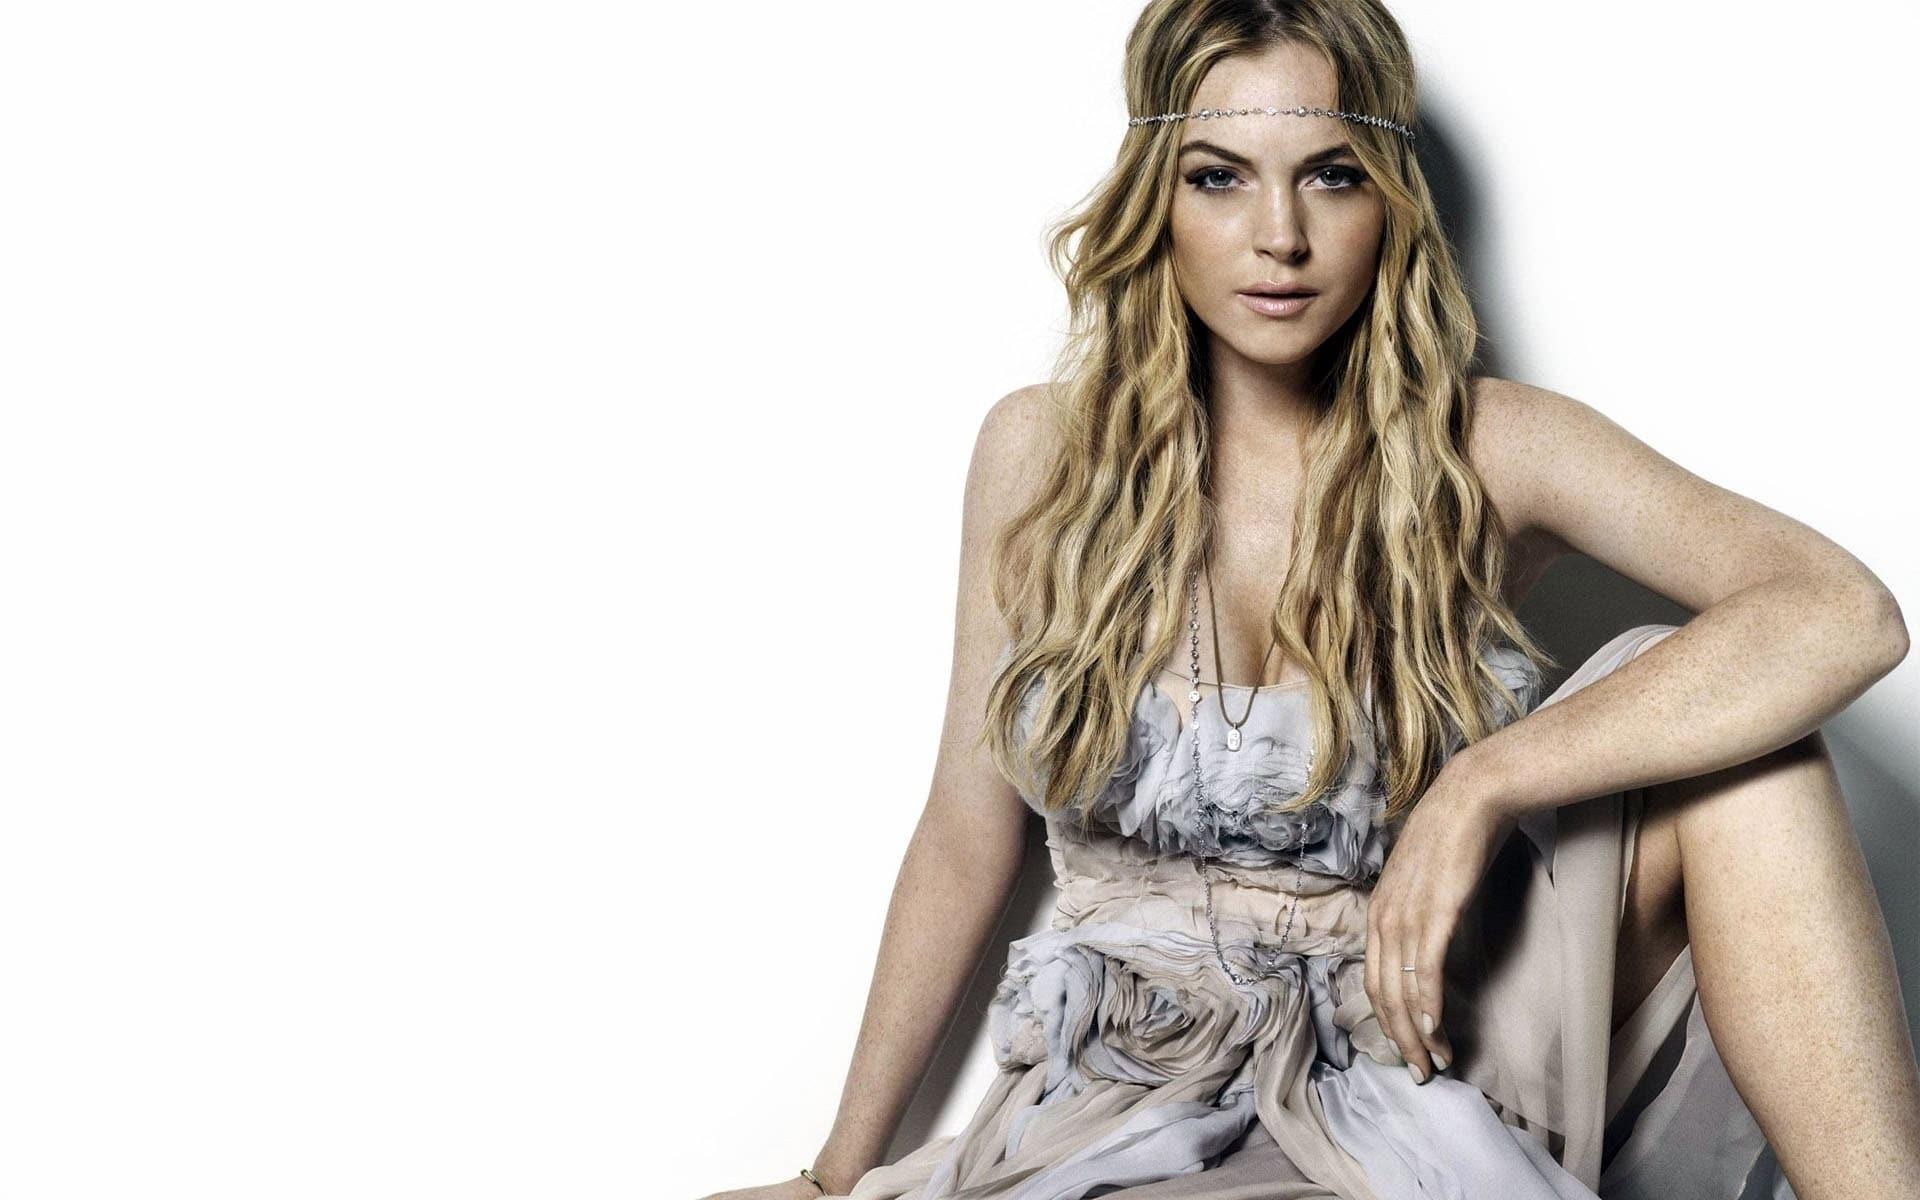 Lindsay Lohan Background